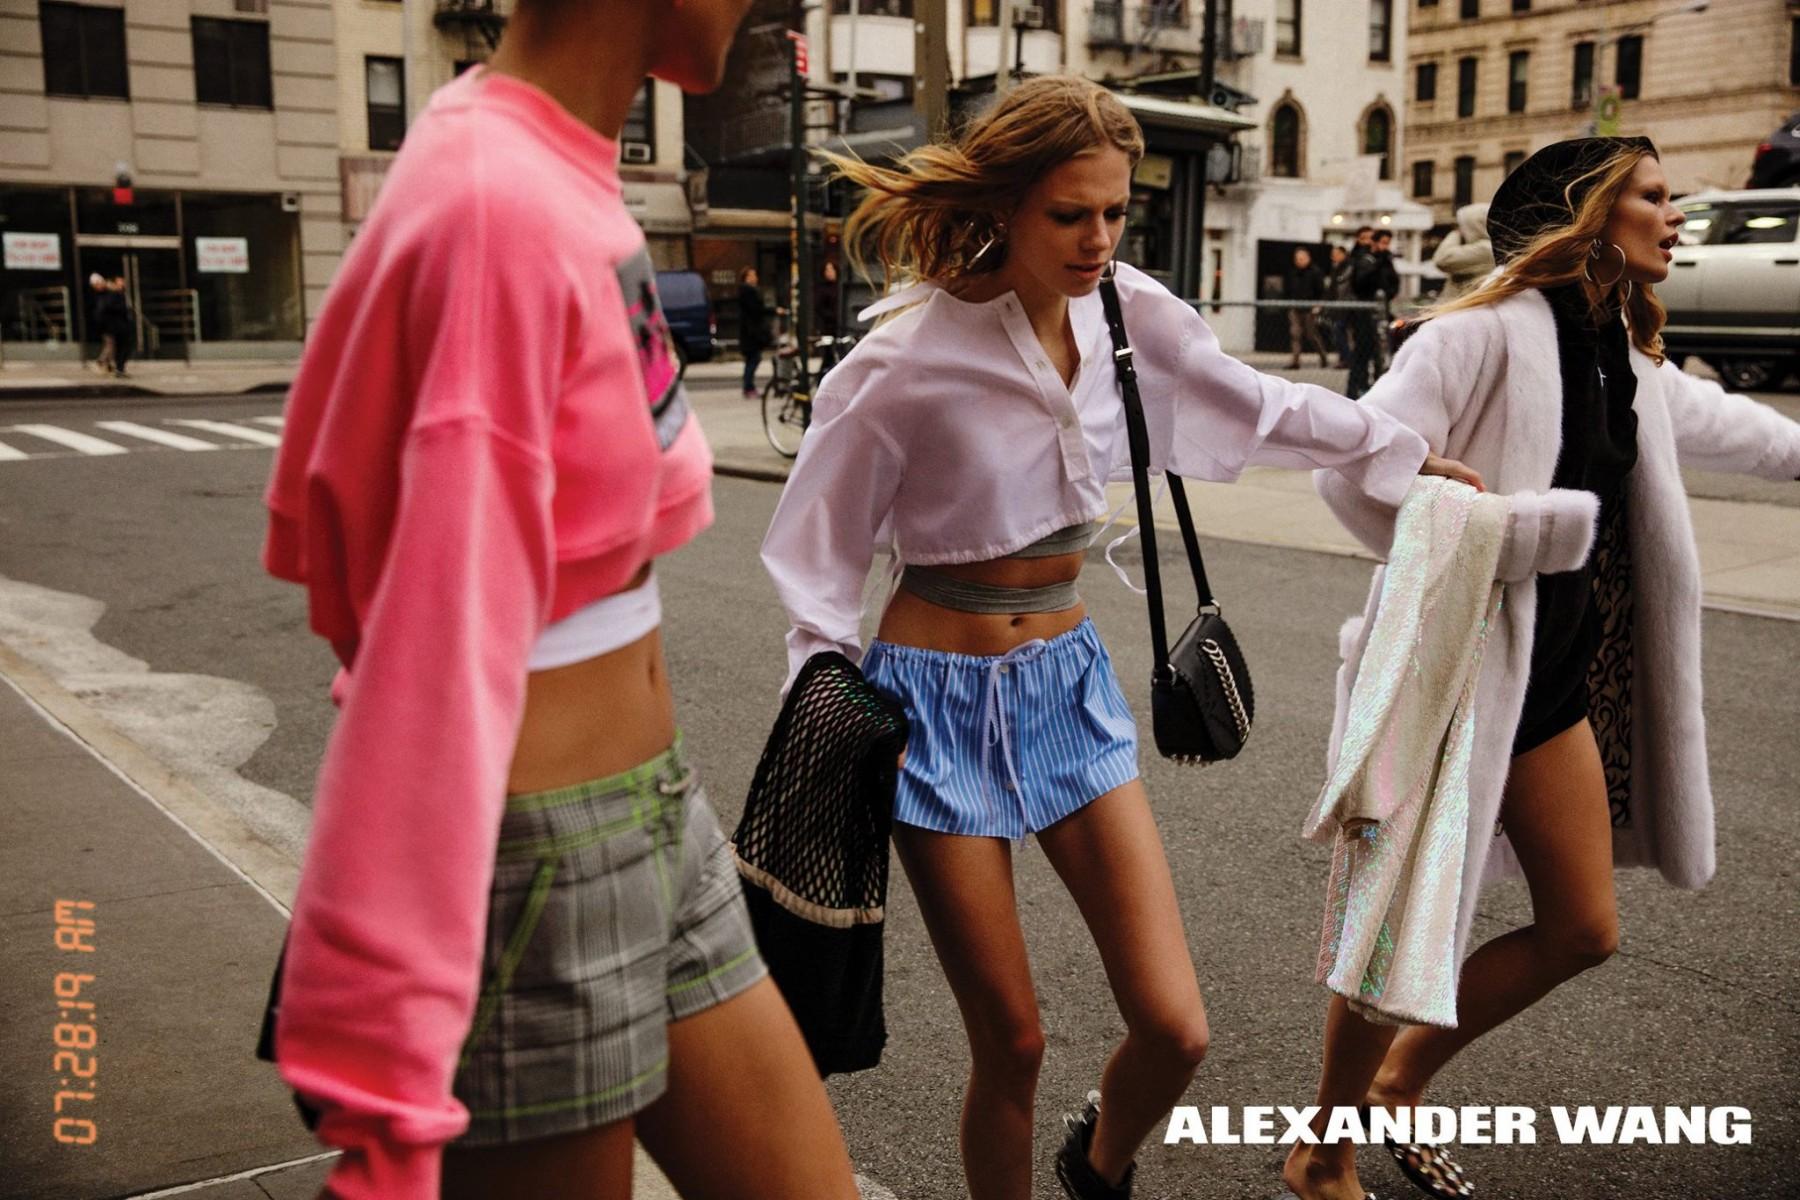 alexander-wang-lil-yachty-anna-ewers-lexi-boling-binx-walton-6-1800x1200